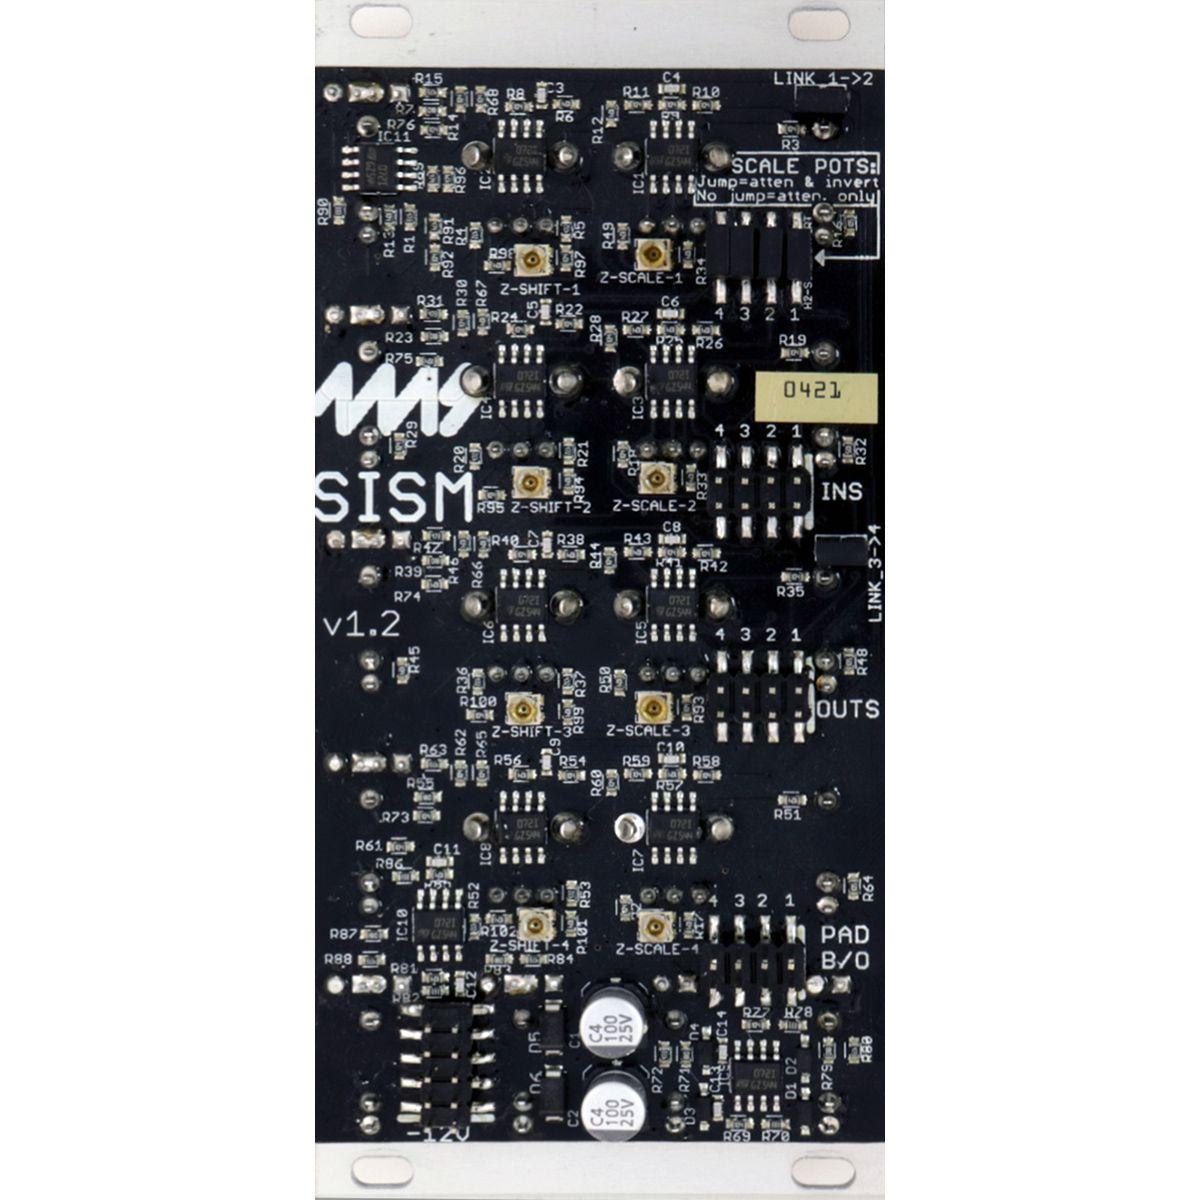 4ms Shifting Inverting Signal Mingler Eurorack Module (SISM)